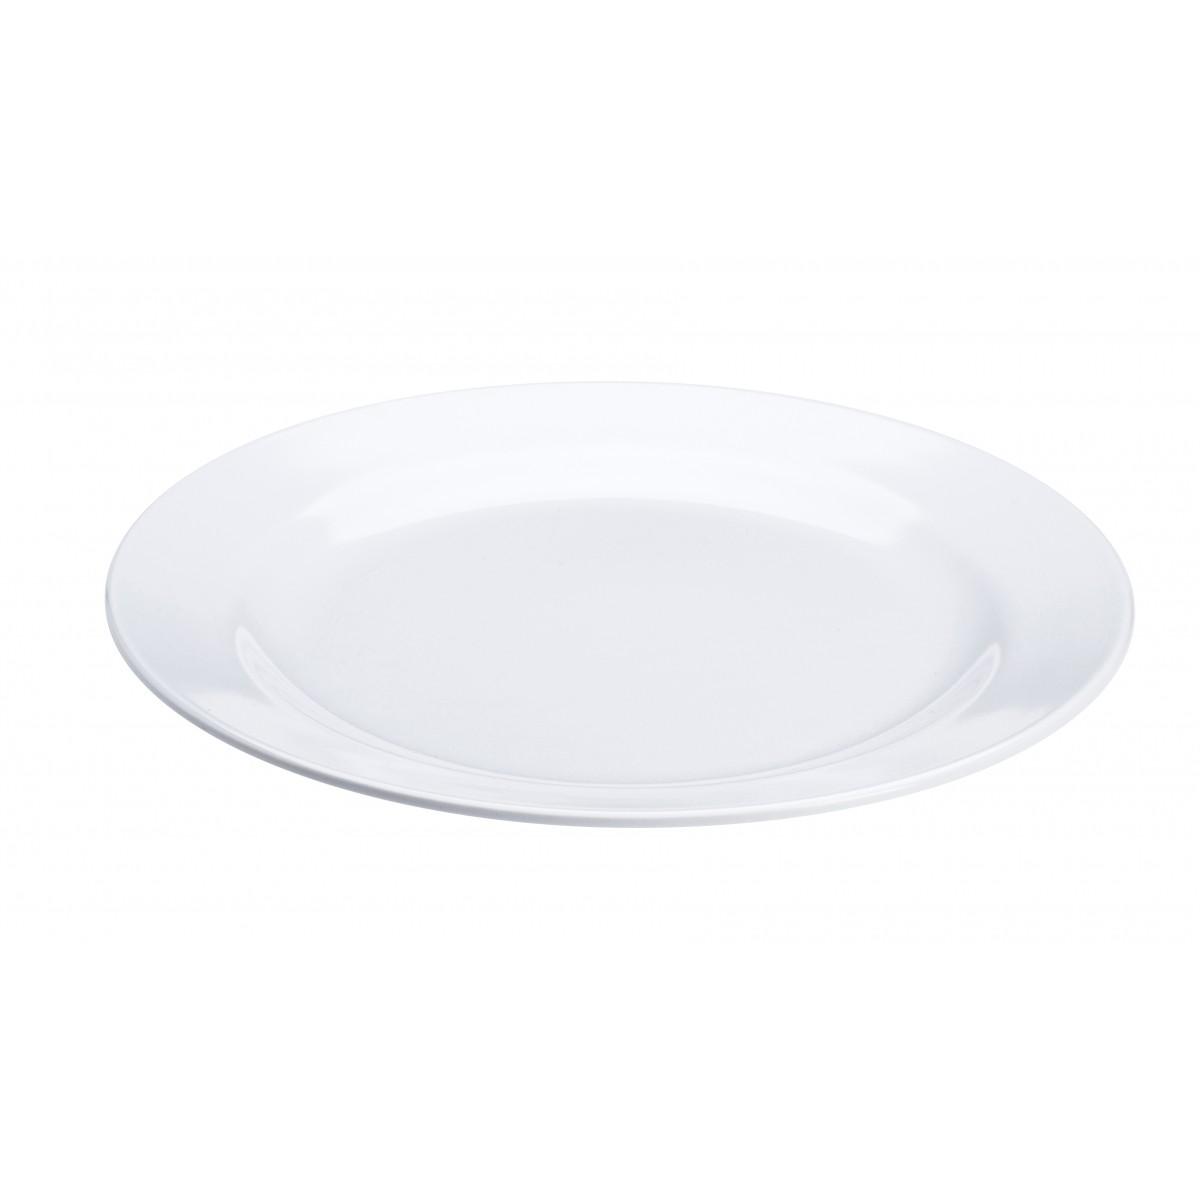 PLAST1 Melamin tallerken 25 cm hvid